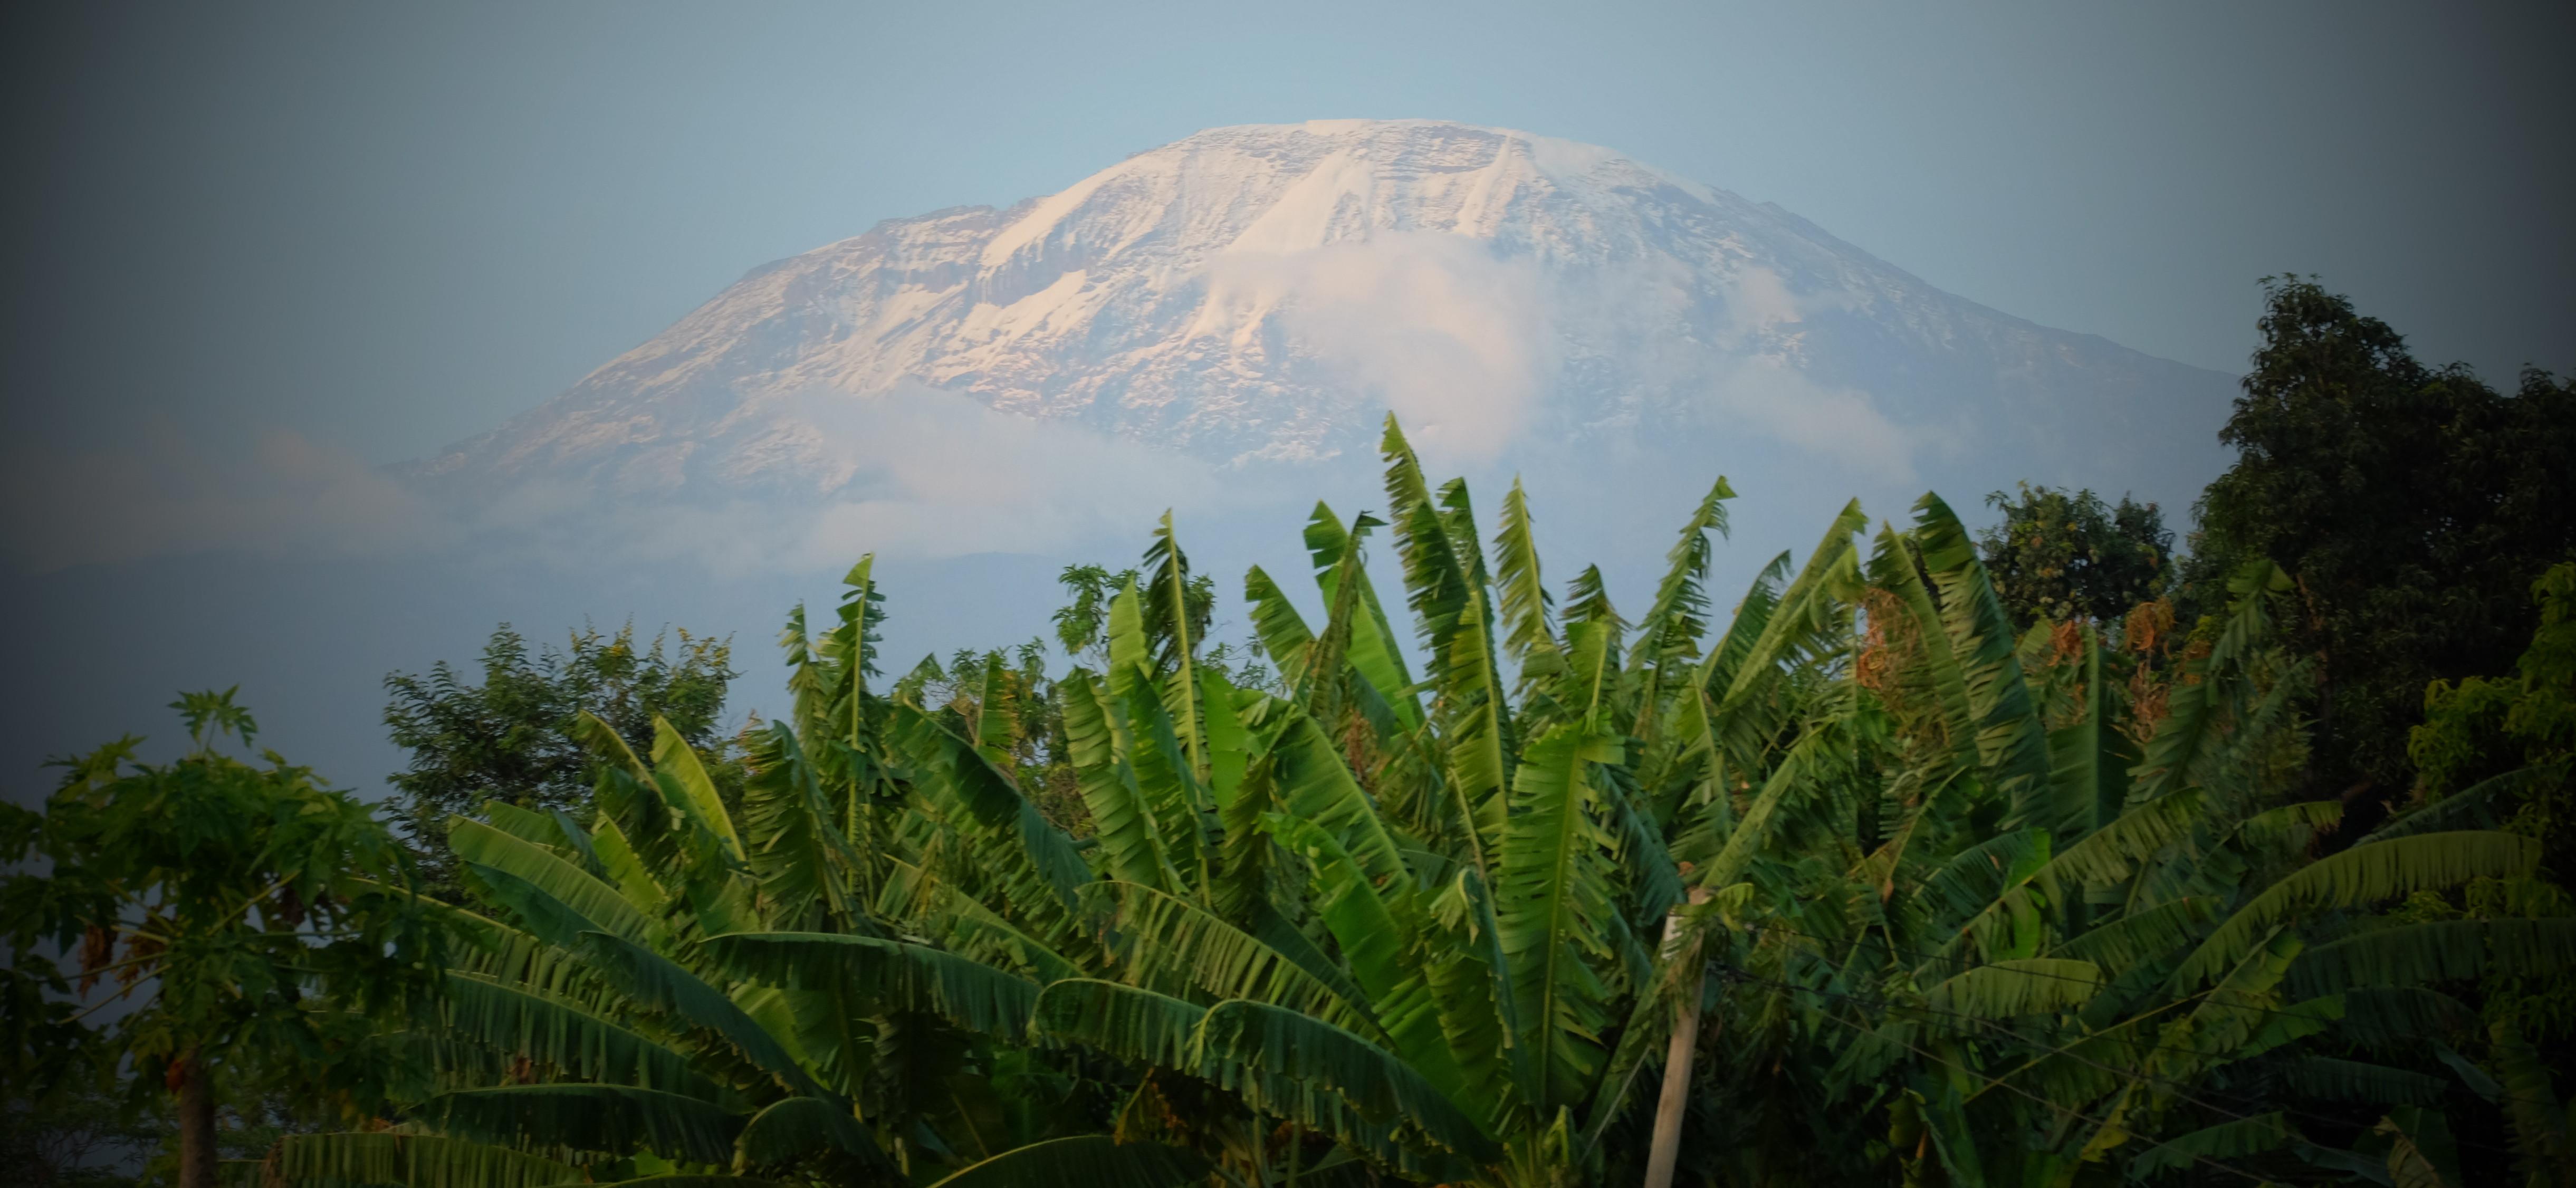 Kilimanjaro-e1433661643227